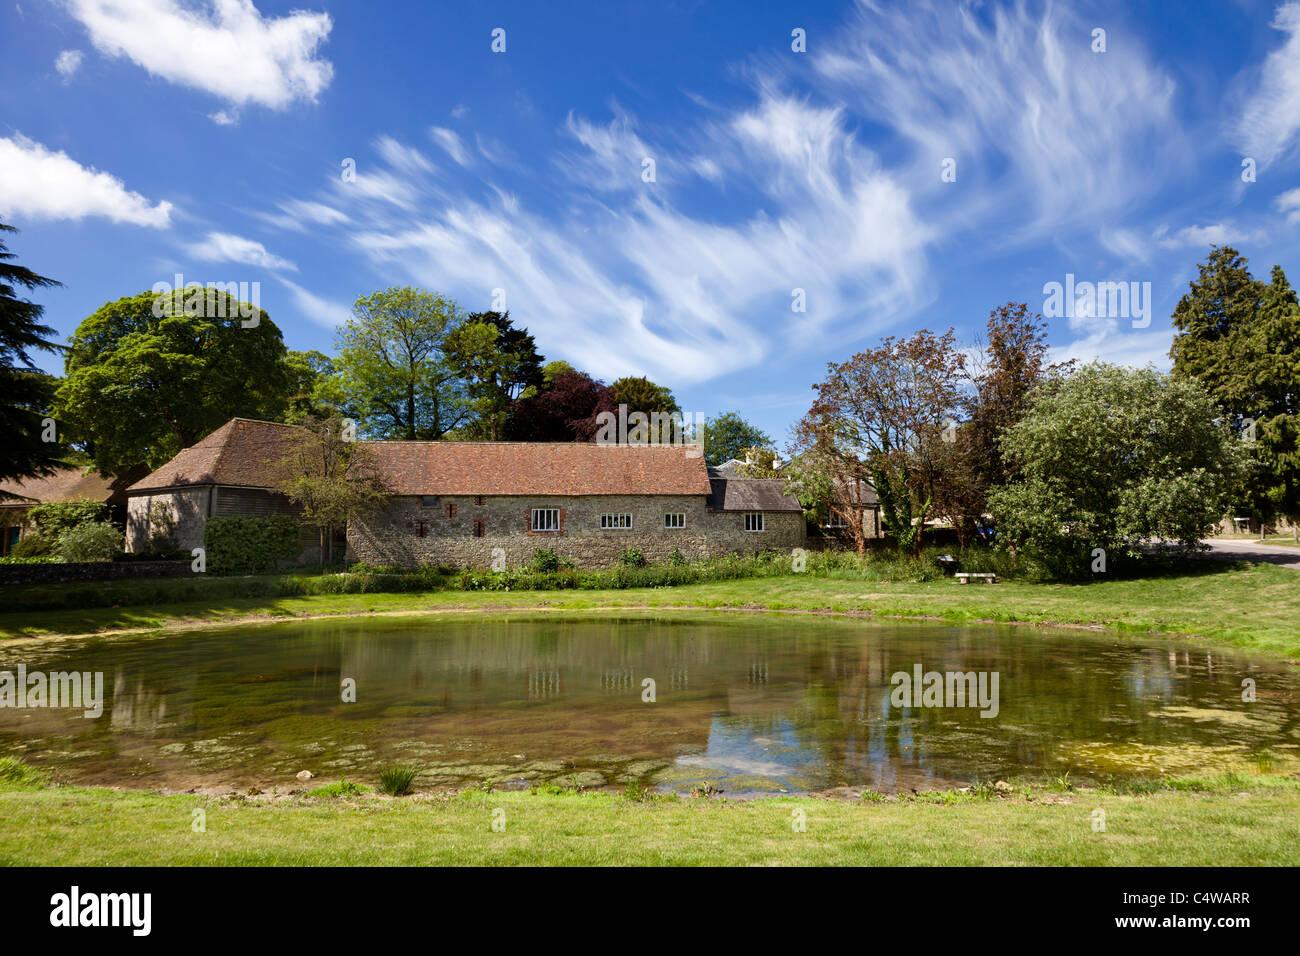 Barn conversion house and Ashmore village pond, Dorset, England, UK - Stock Image